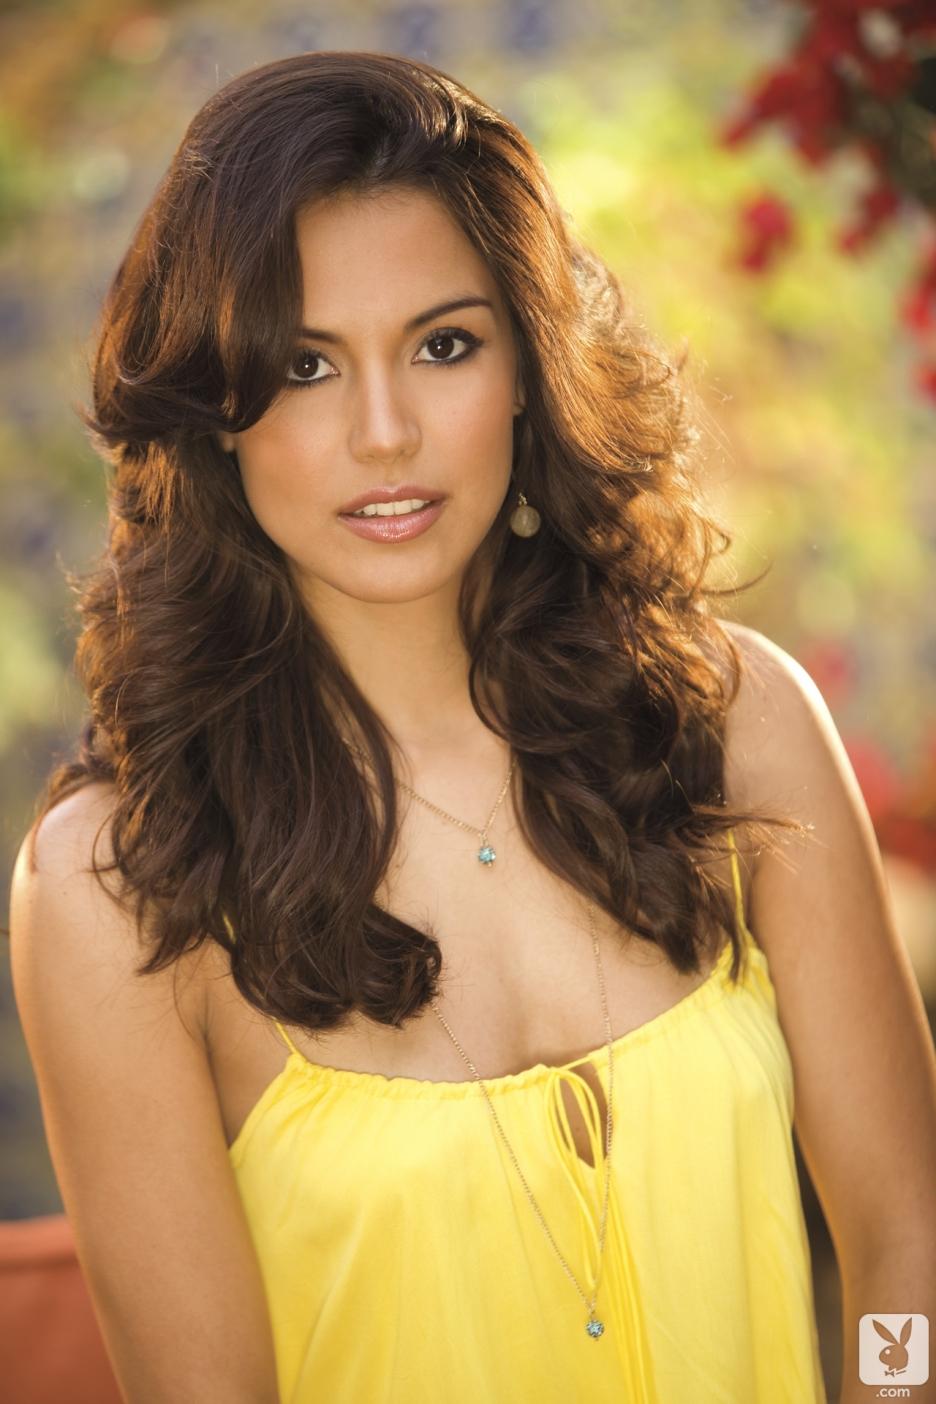 Playboy Playmate Raquel Pomplun Received a Jaguar F-Type